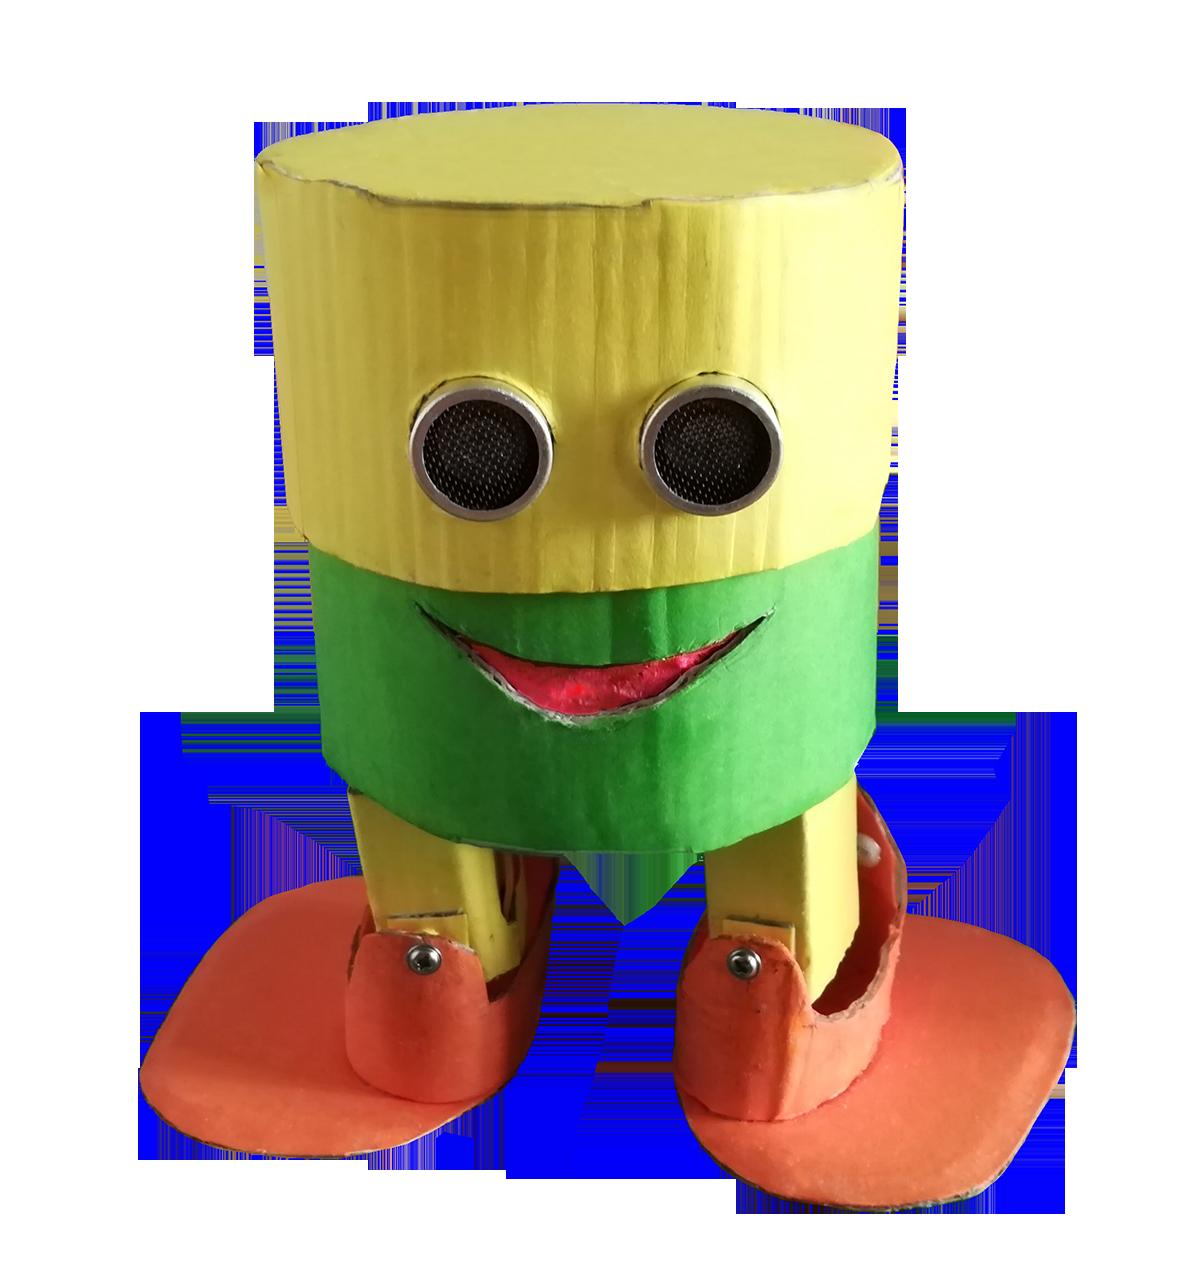 Robot OttoDIY Cardy